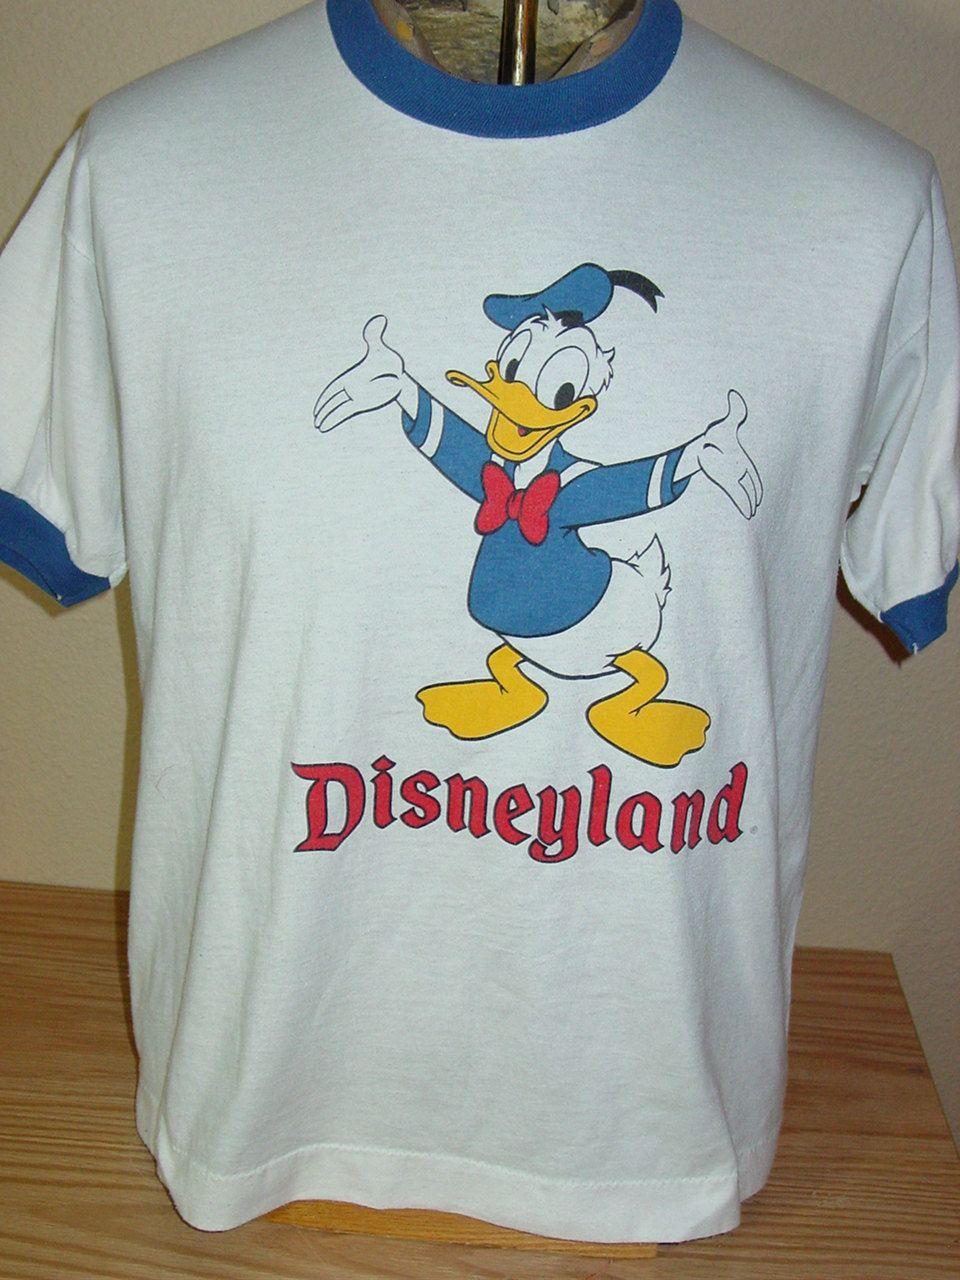 Vintage 1980s Donald Duck Disneyland Ringer T Shirt Large Shirts Disneyland T Shirt